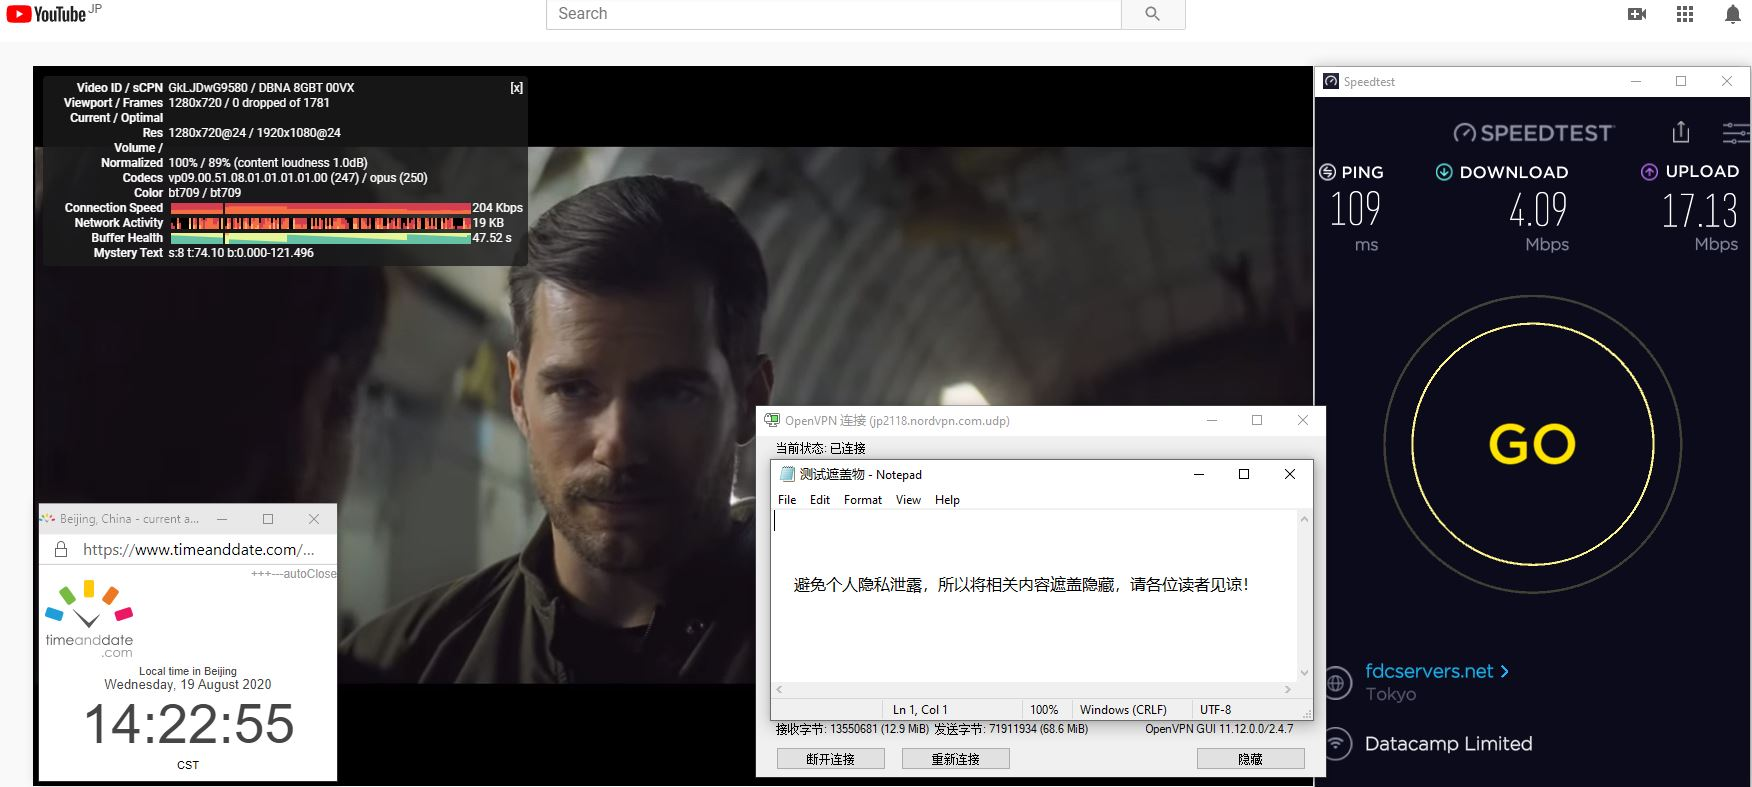 Windows10 NordVPN OpenVPN jp2118 中国VPN 翻墙 科学上网 翻墙速度测试 - 20200819